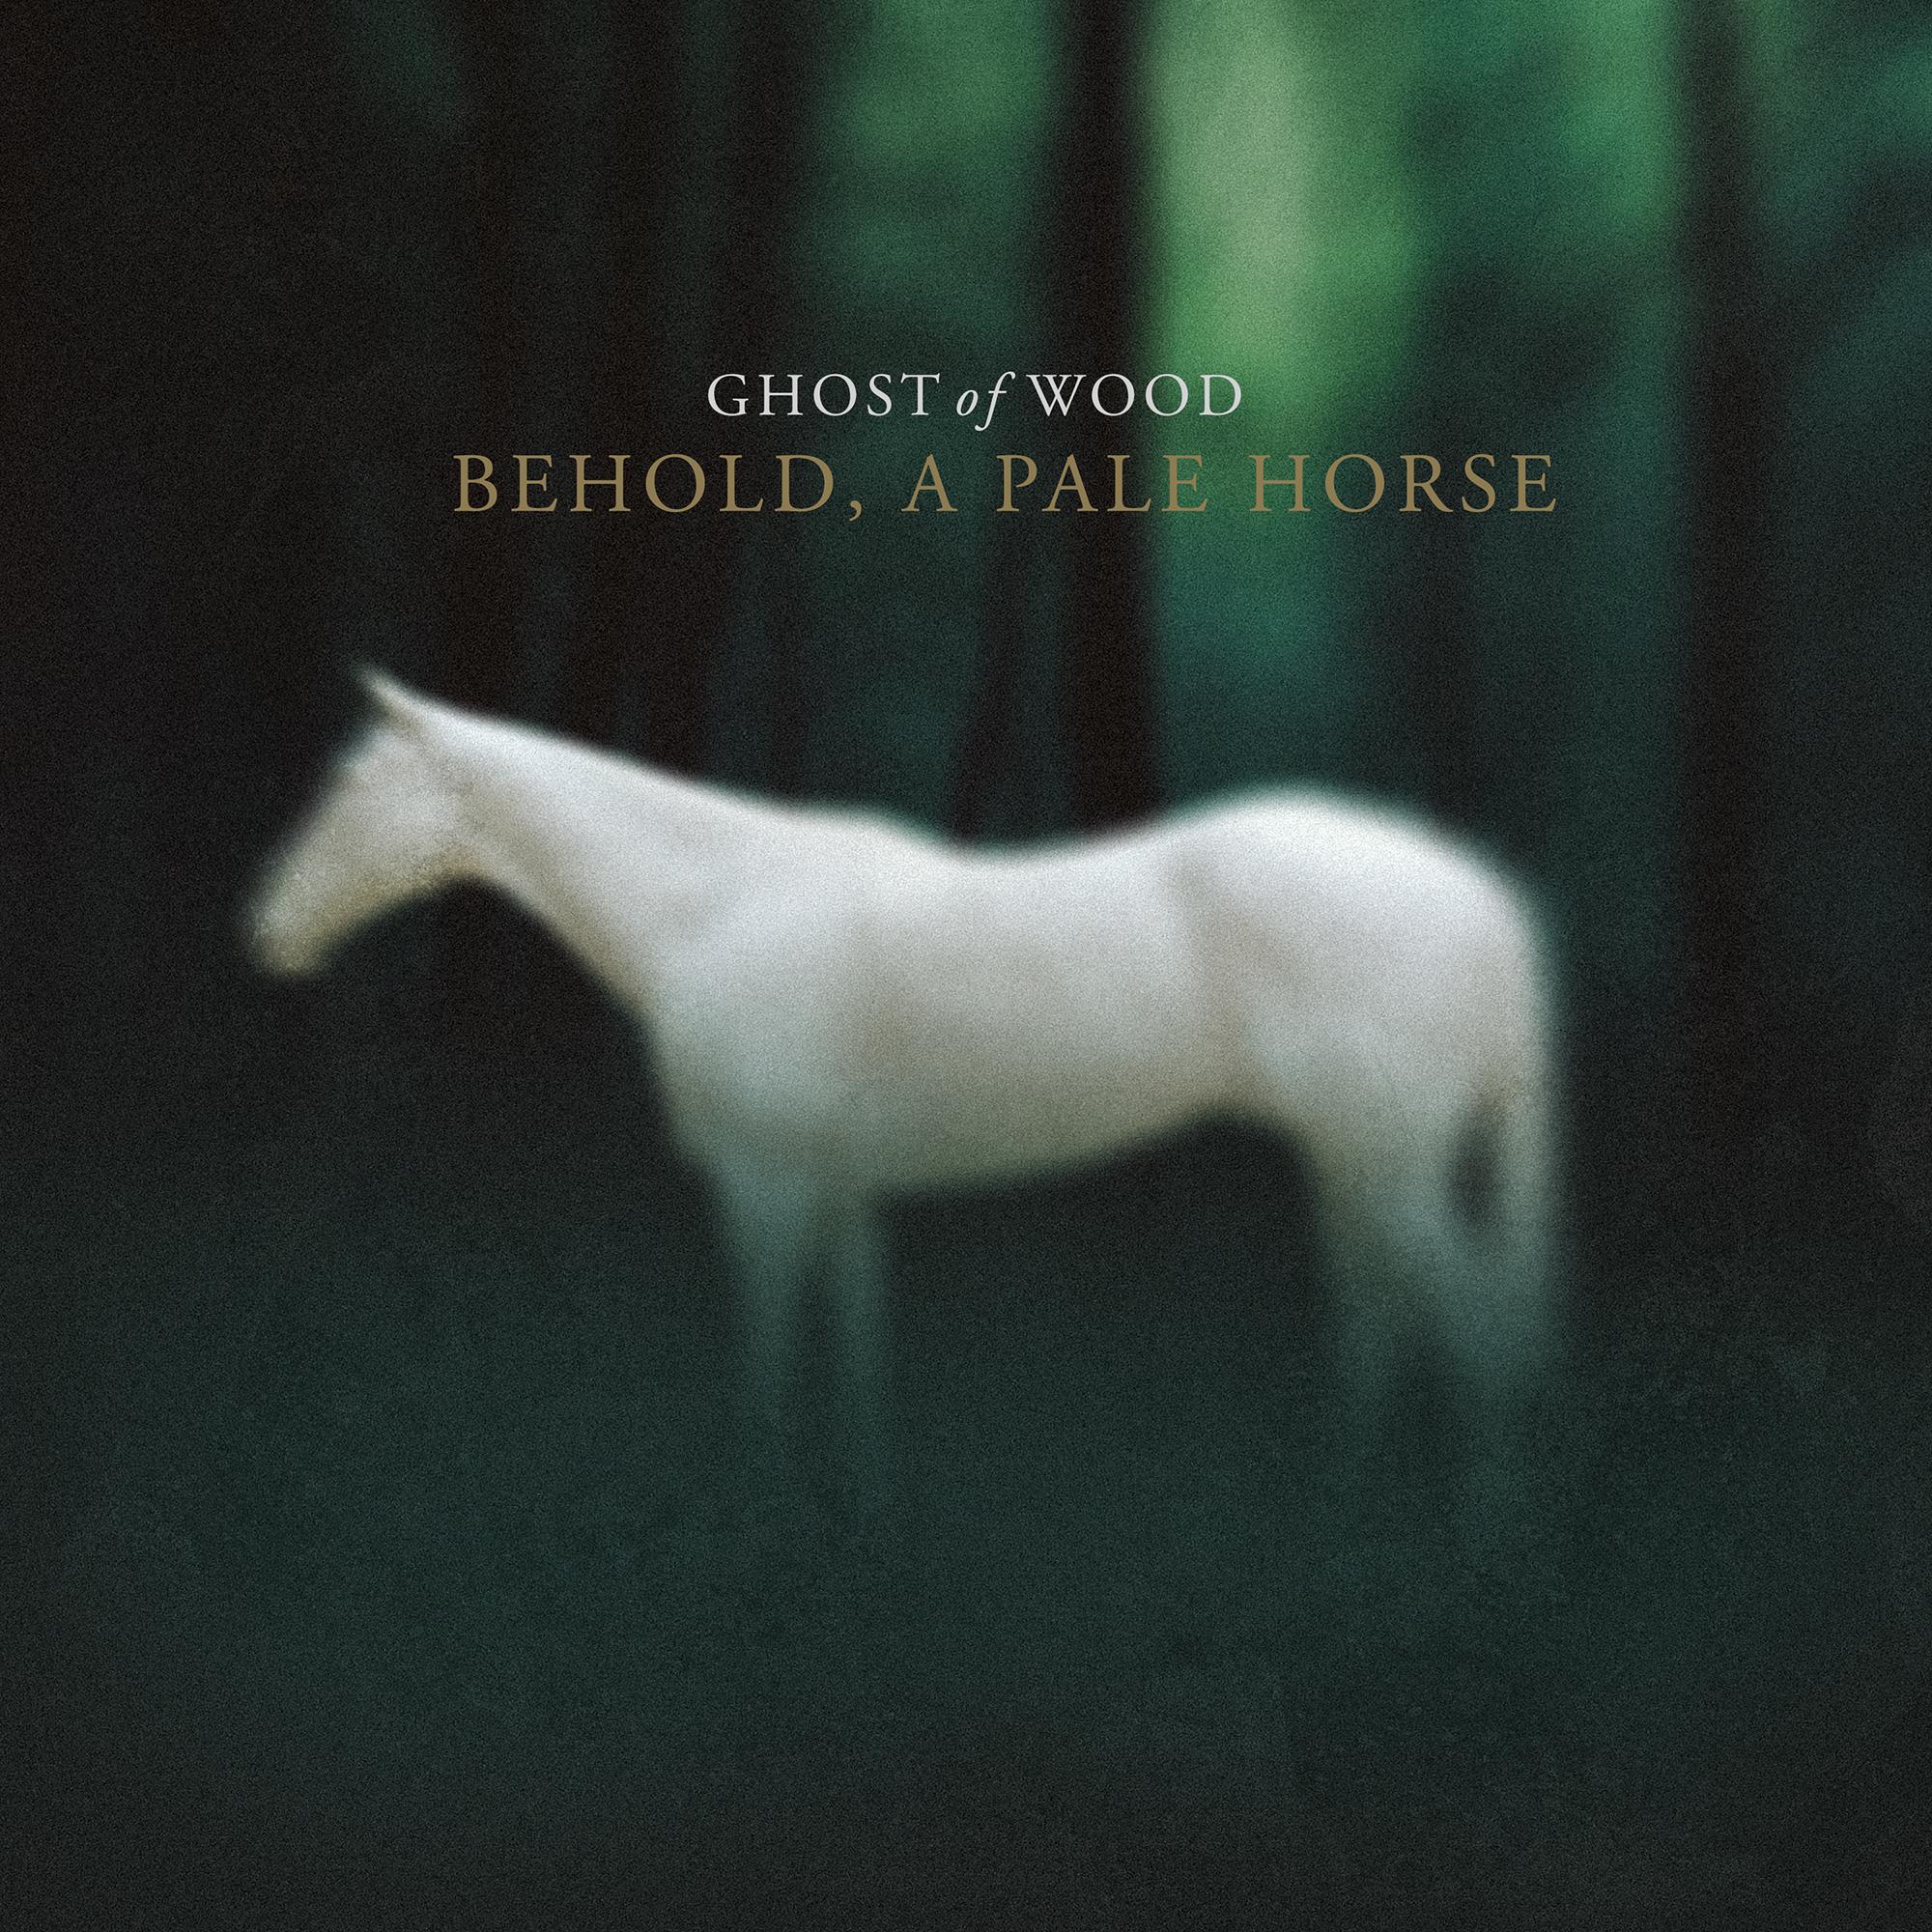 Behold A Pale Horse v3 2000x2000.jpg